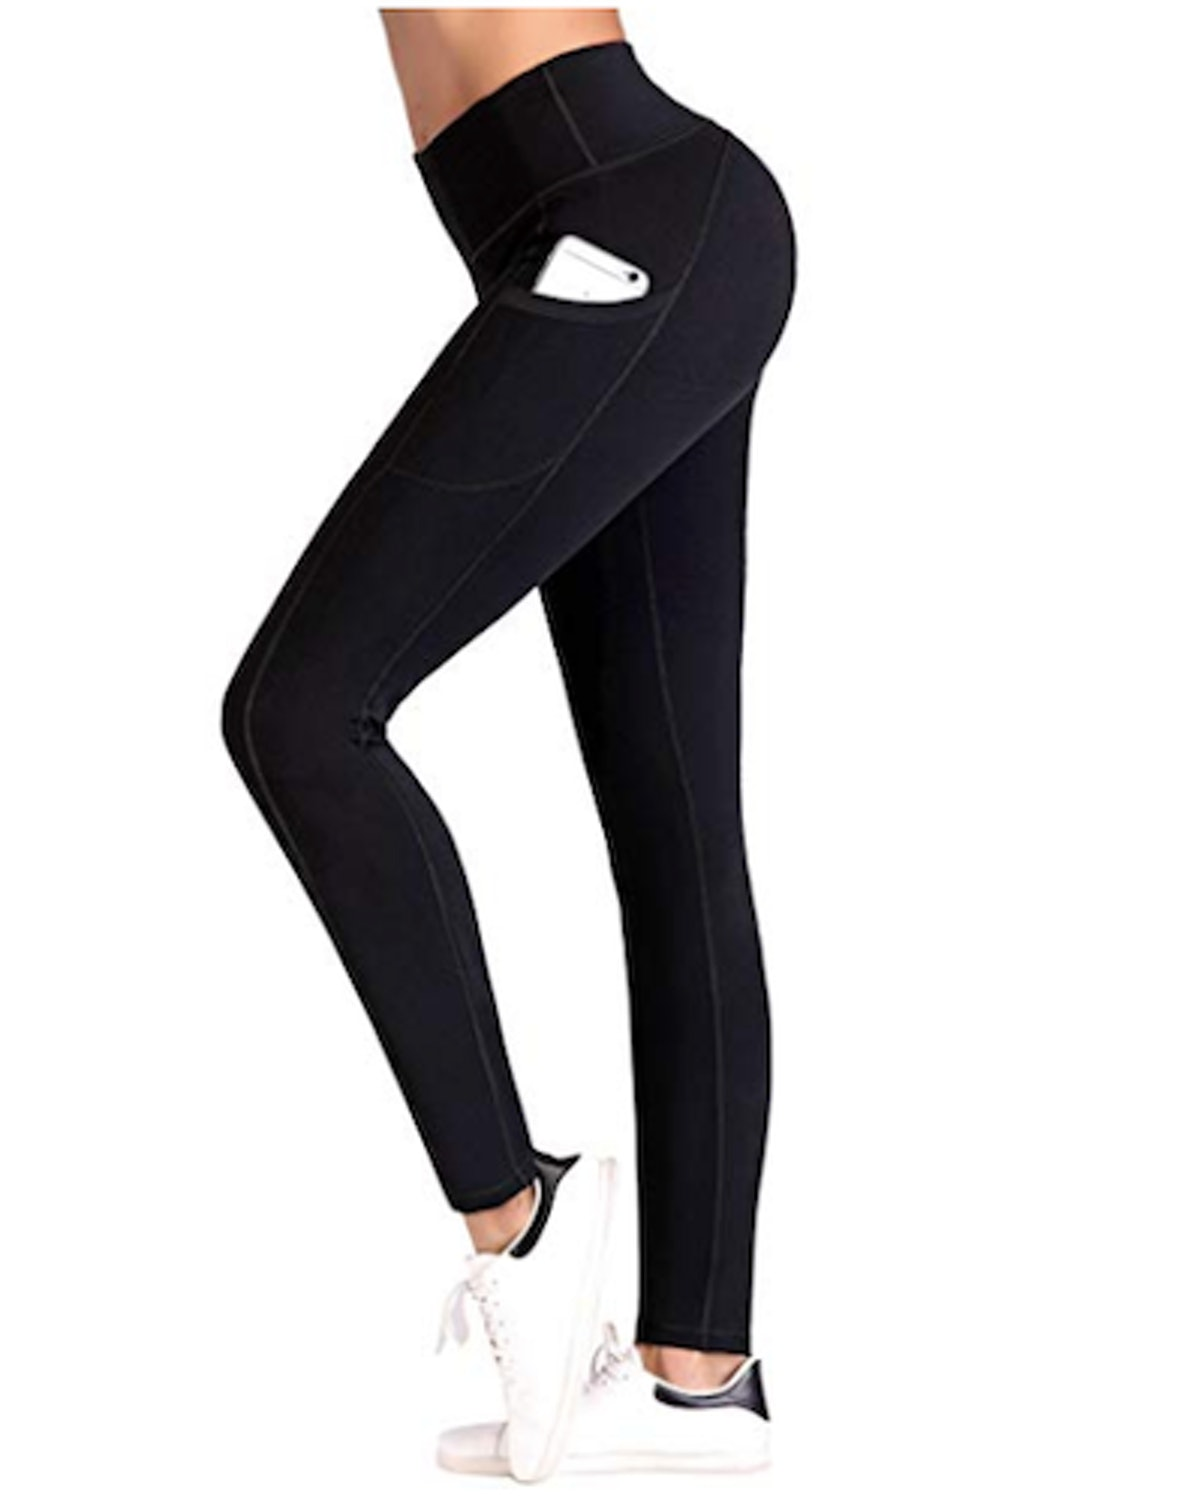 IUGA High Waist Yoga Pants with Pockets